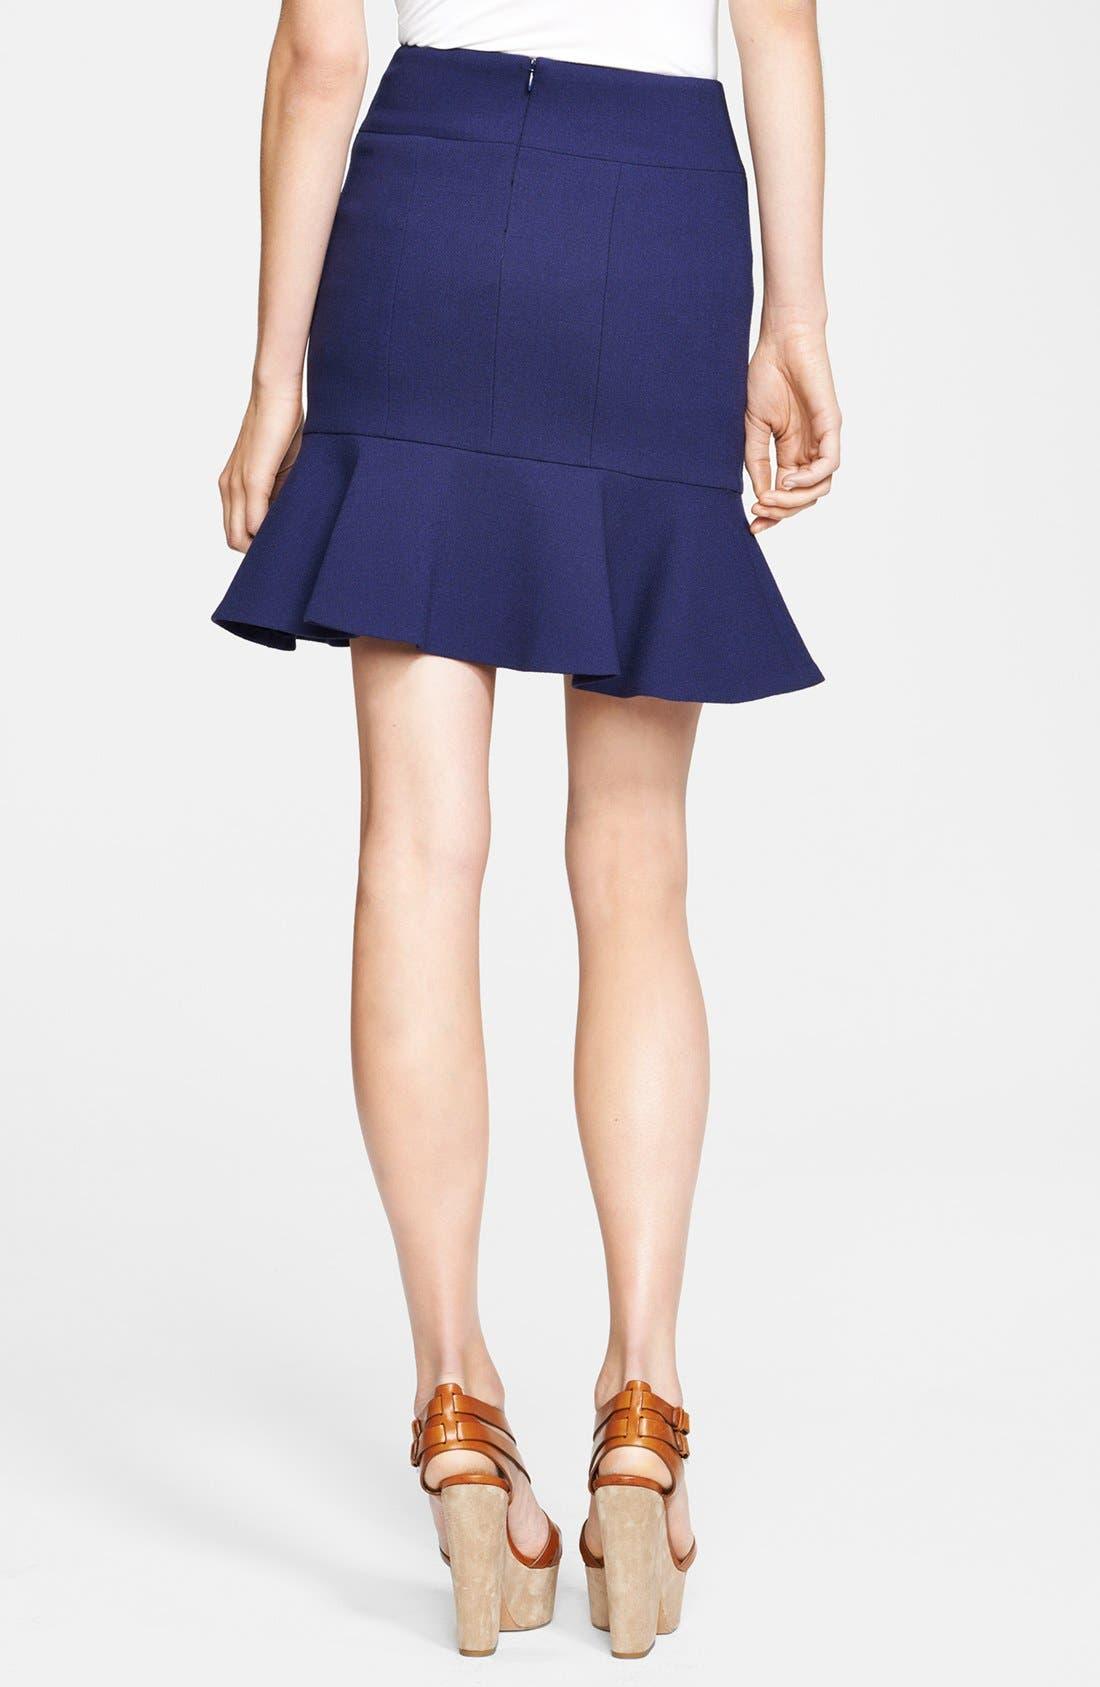 Alternate Image 2  - Michael Kors Bouclé Stretch Wool Skirt